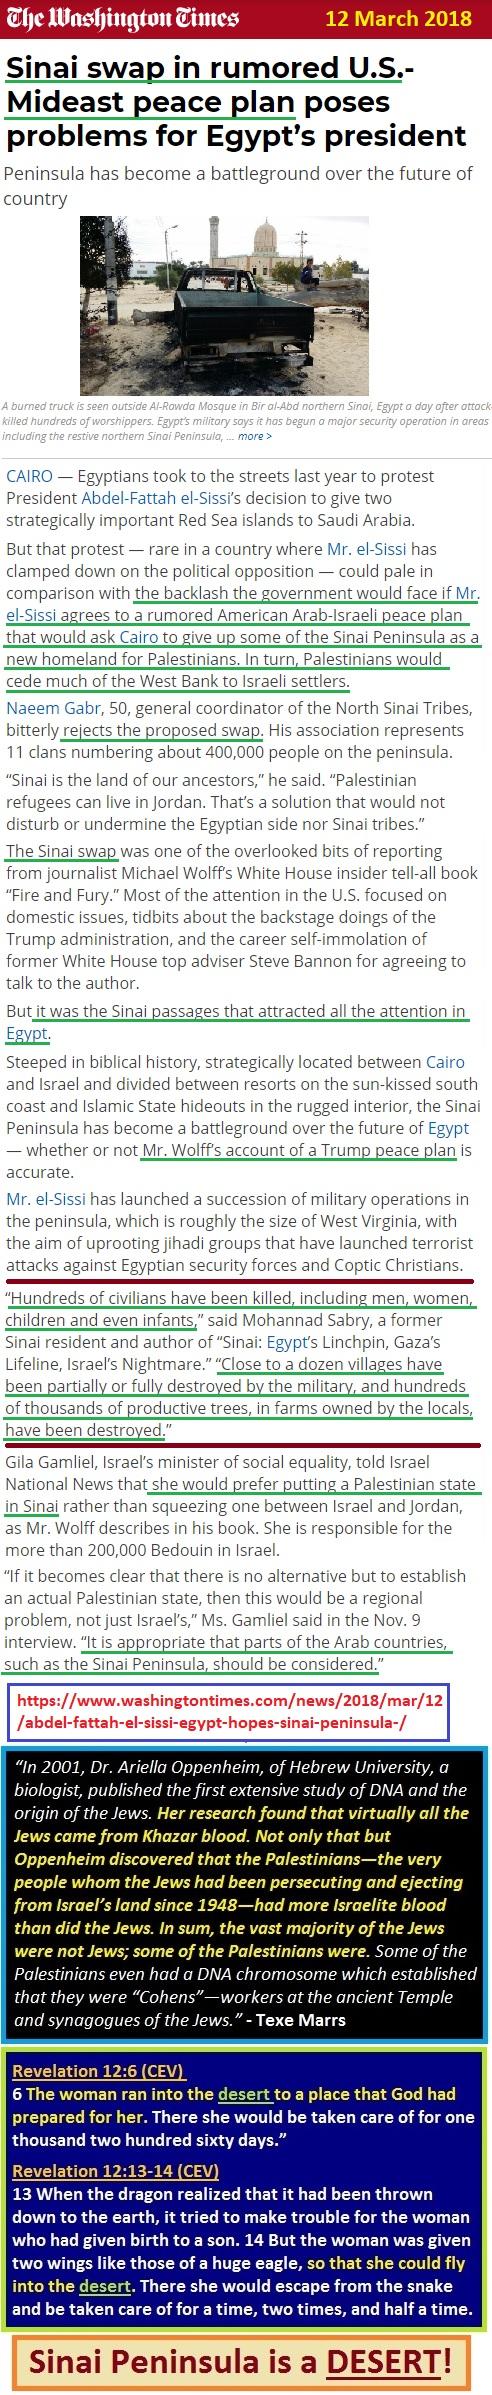 https://www.washingtontimes.com/news/2018/mar/12/abdel-fattah-el-sissi-egypt-hopes-sinai-peninsula-/